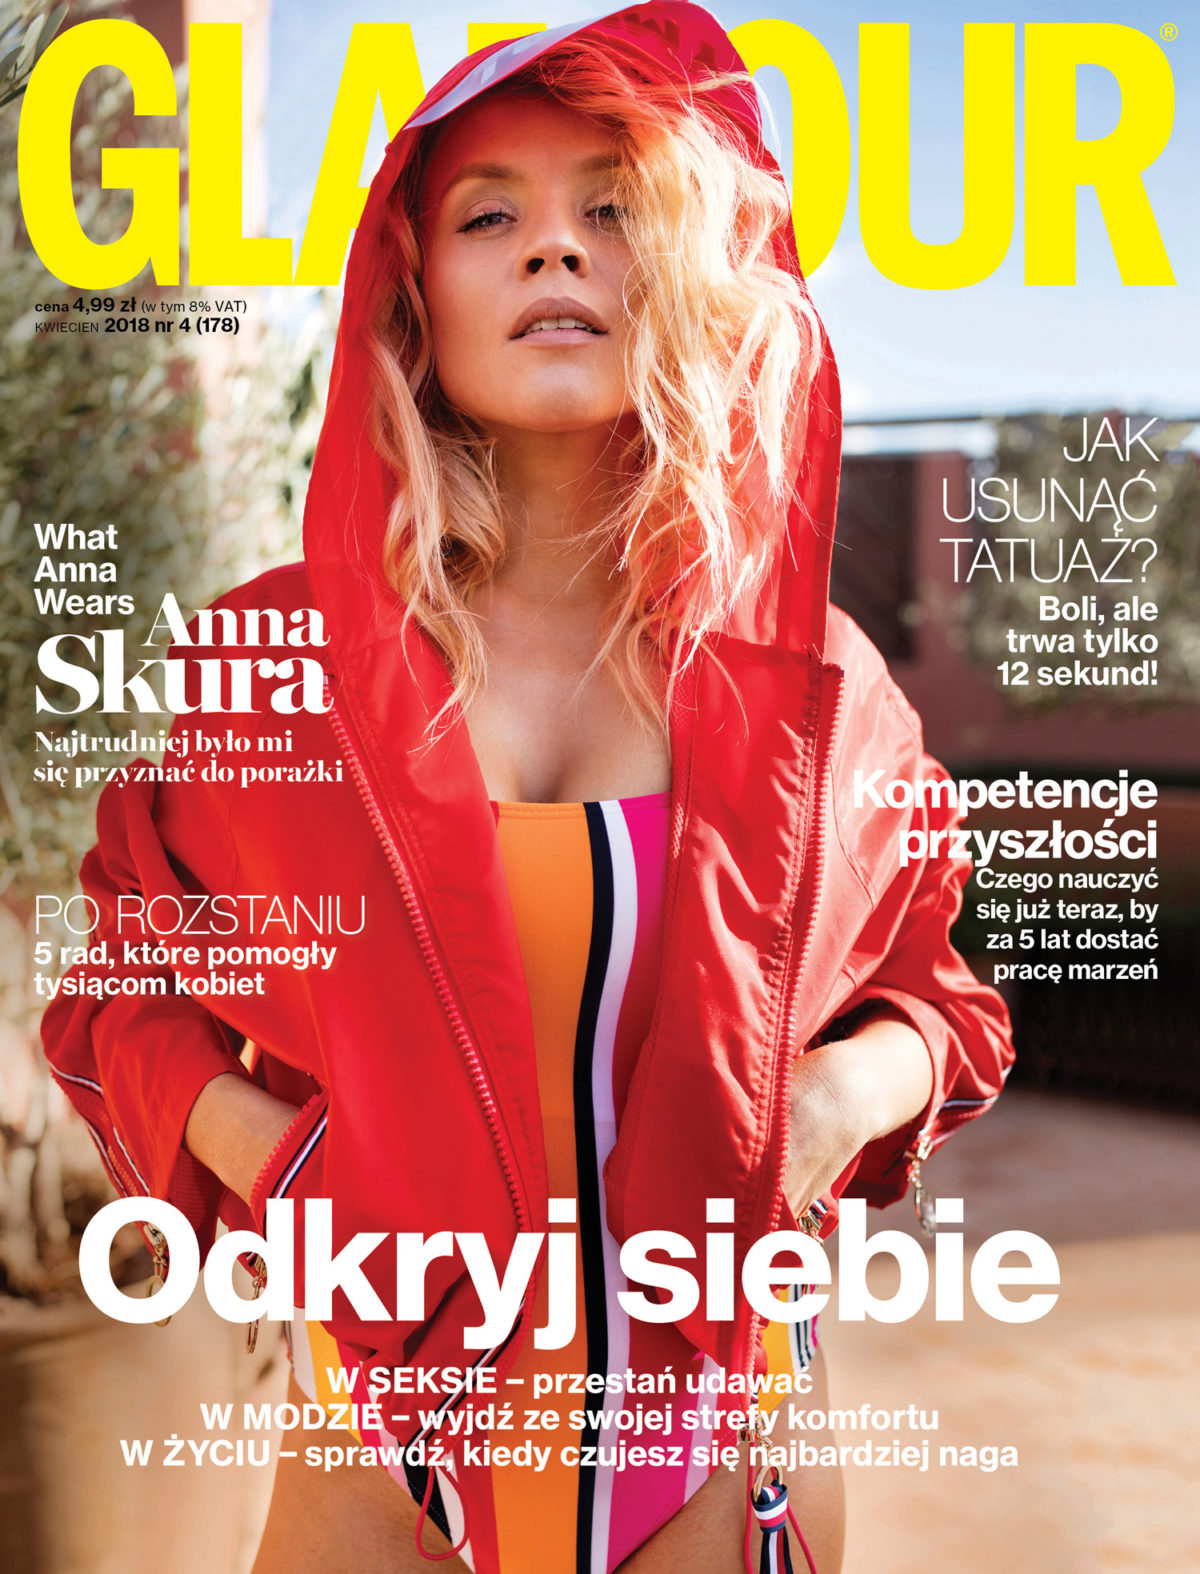 Anna Skura | whatannawears Marcin Biedroń